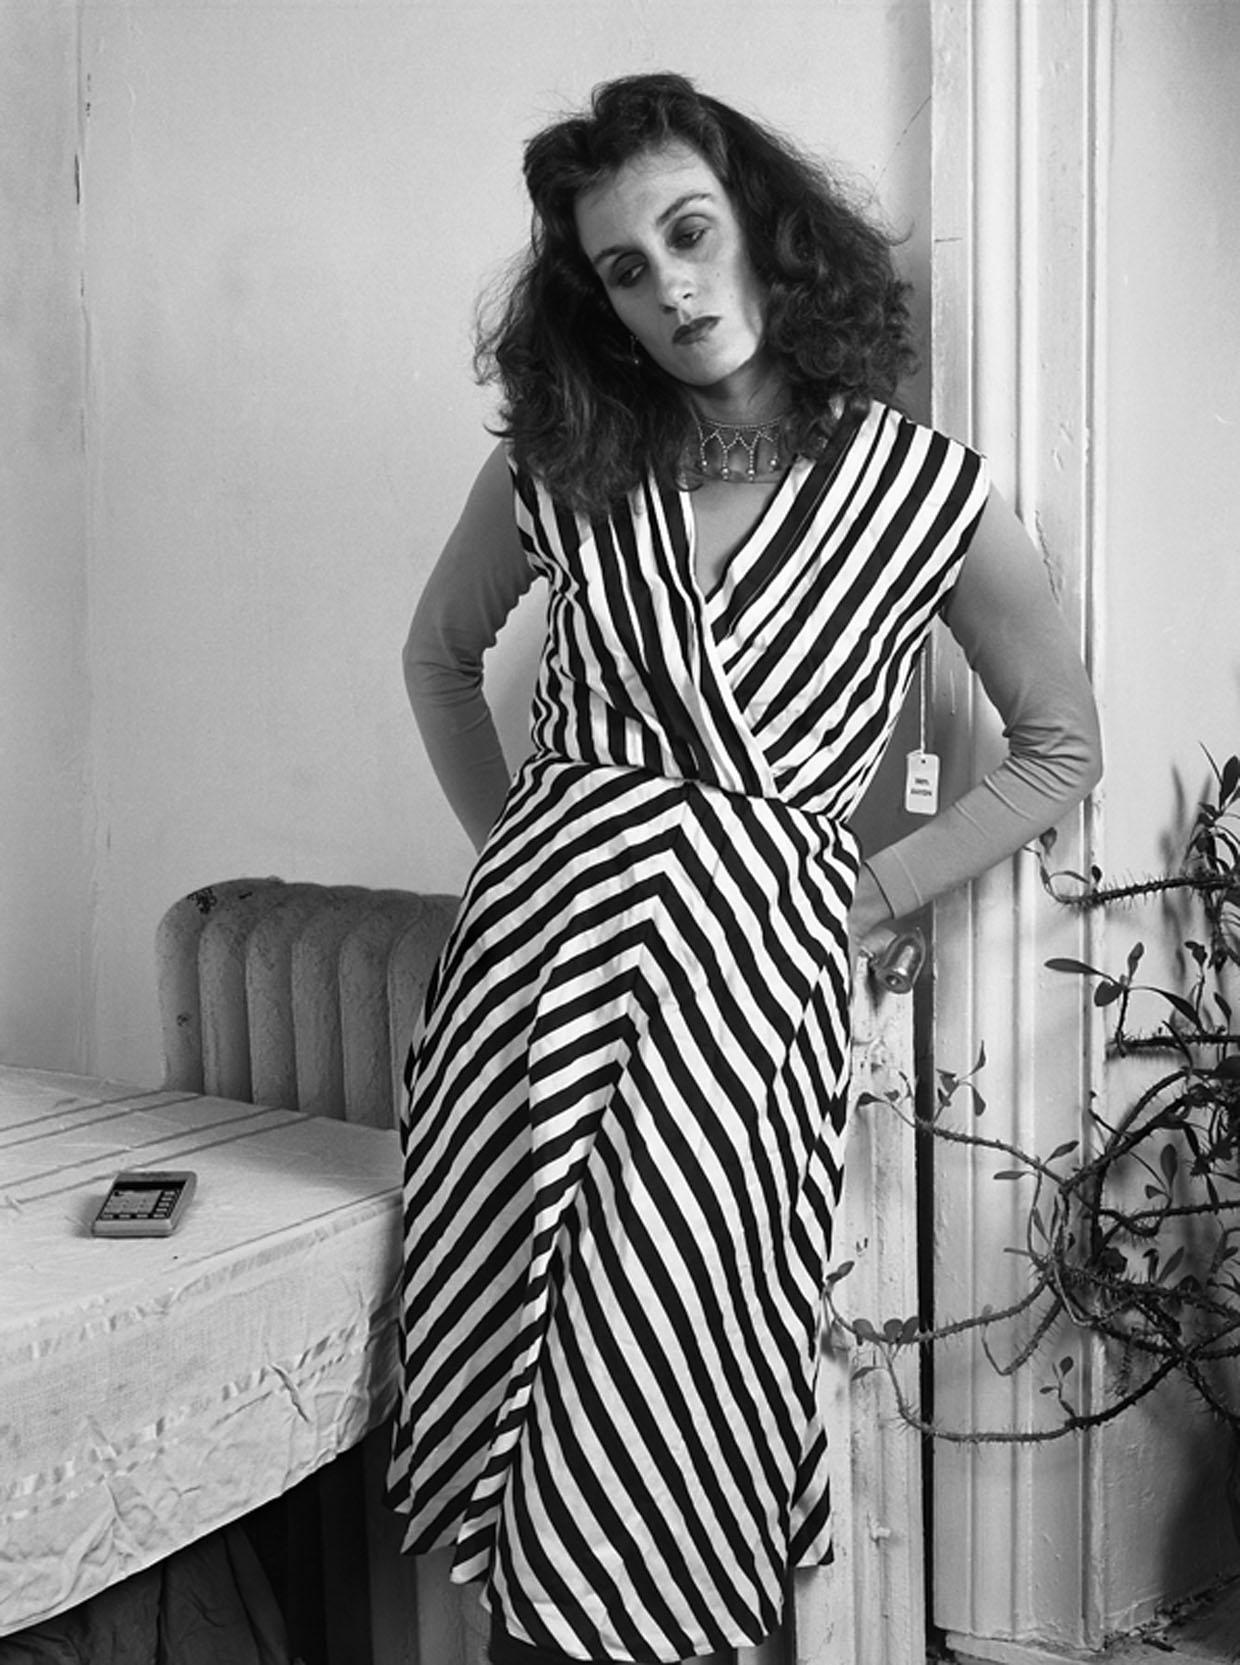 111-Carole-Jean-at-Home,-1981